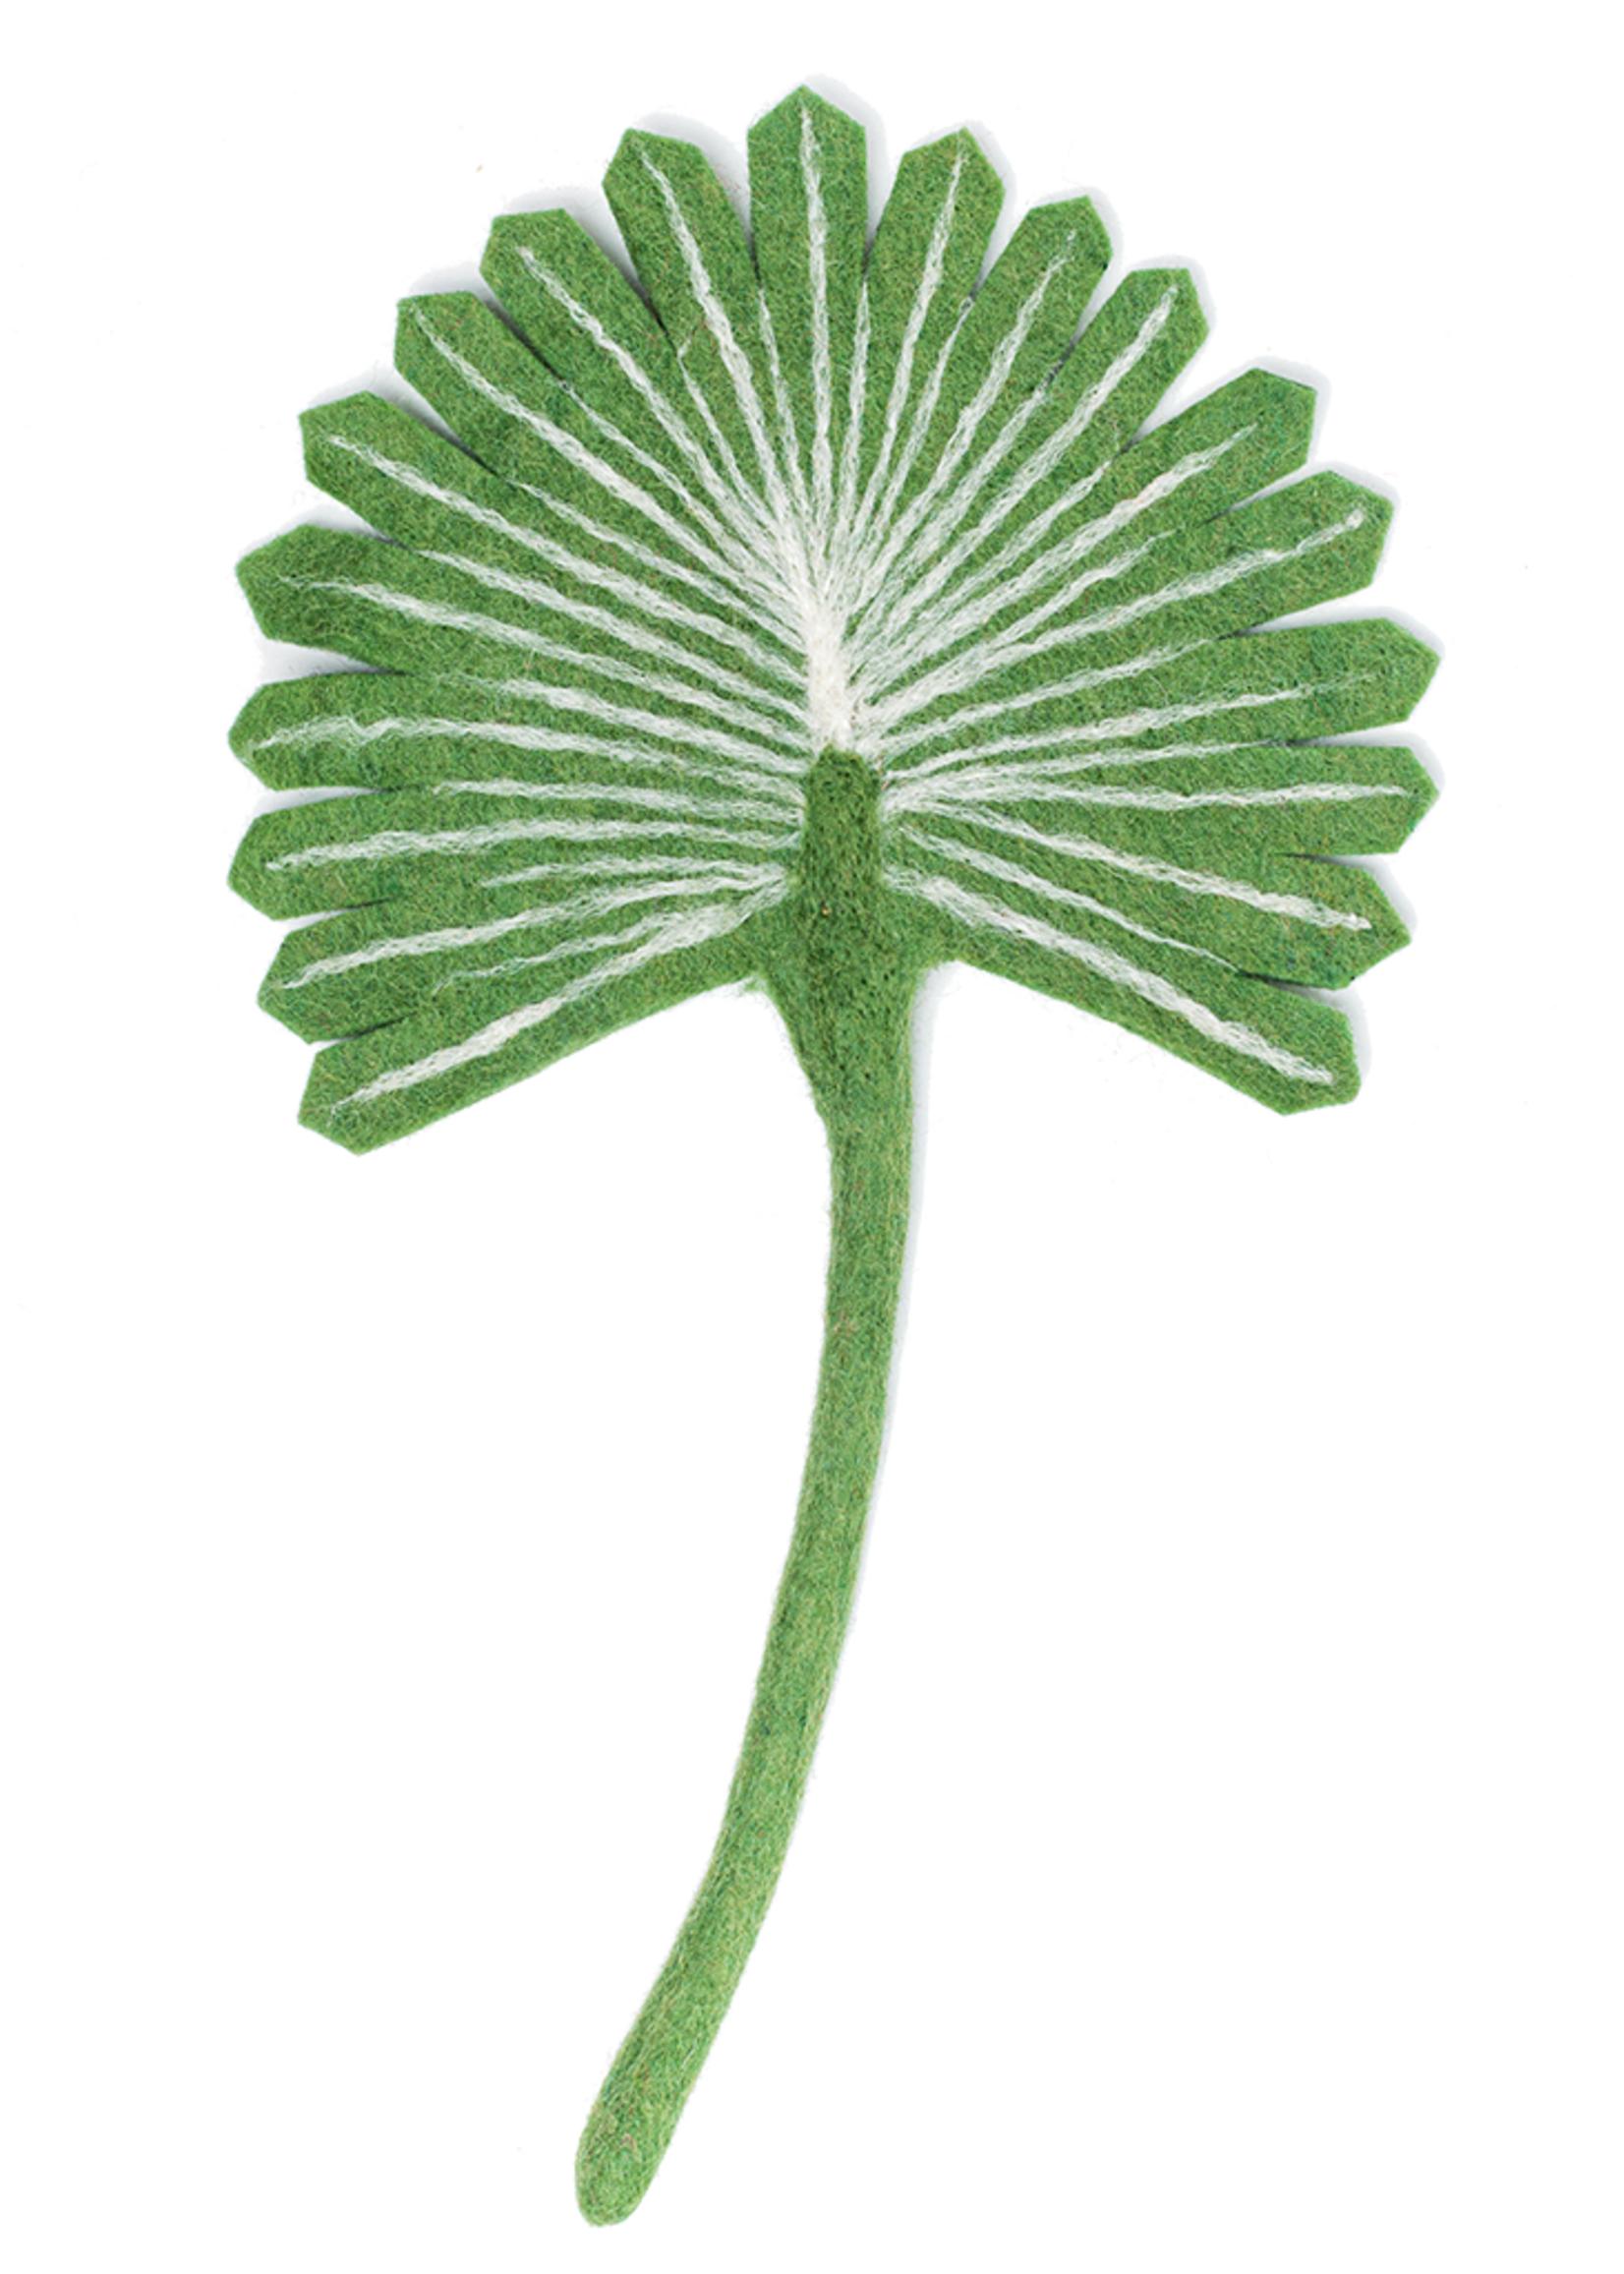 Global Goods Partners Felt Scalloped Fan Palm Leaf